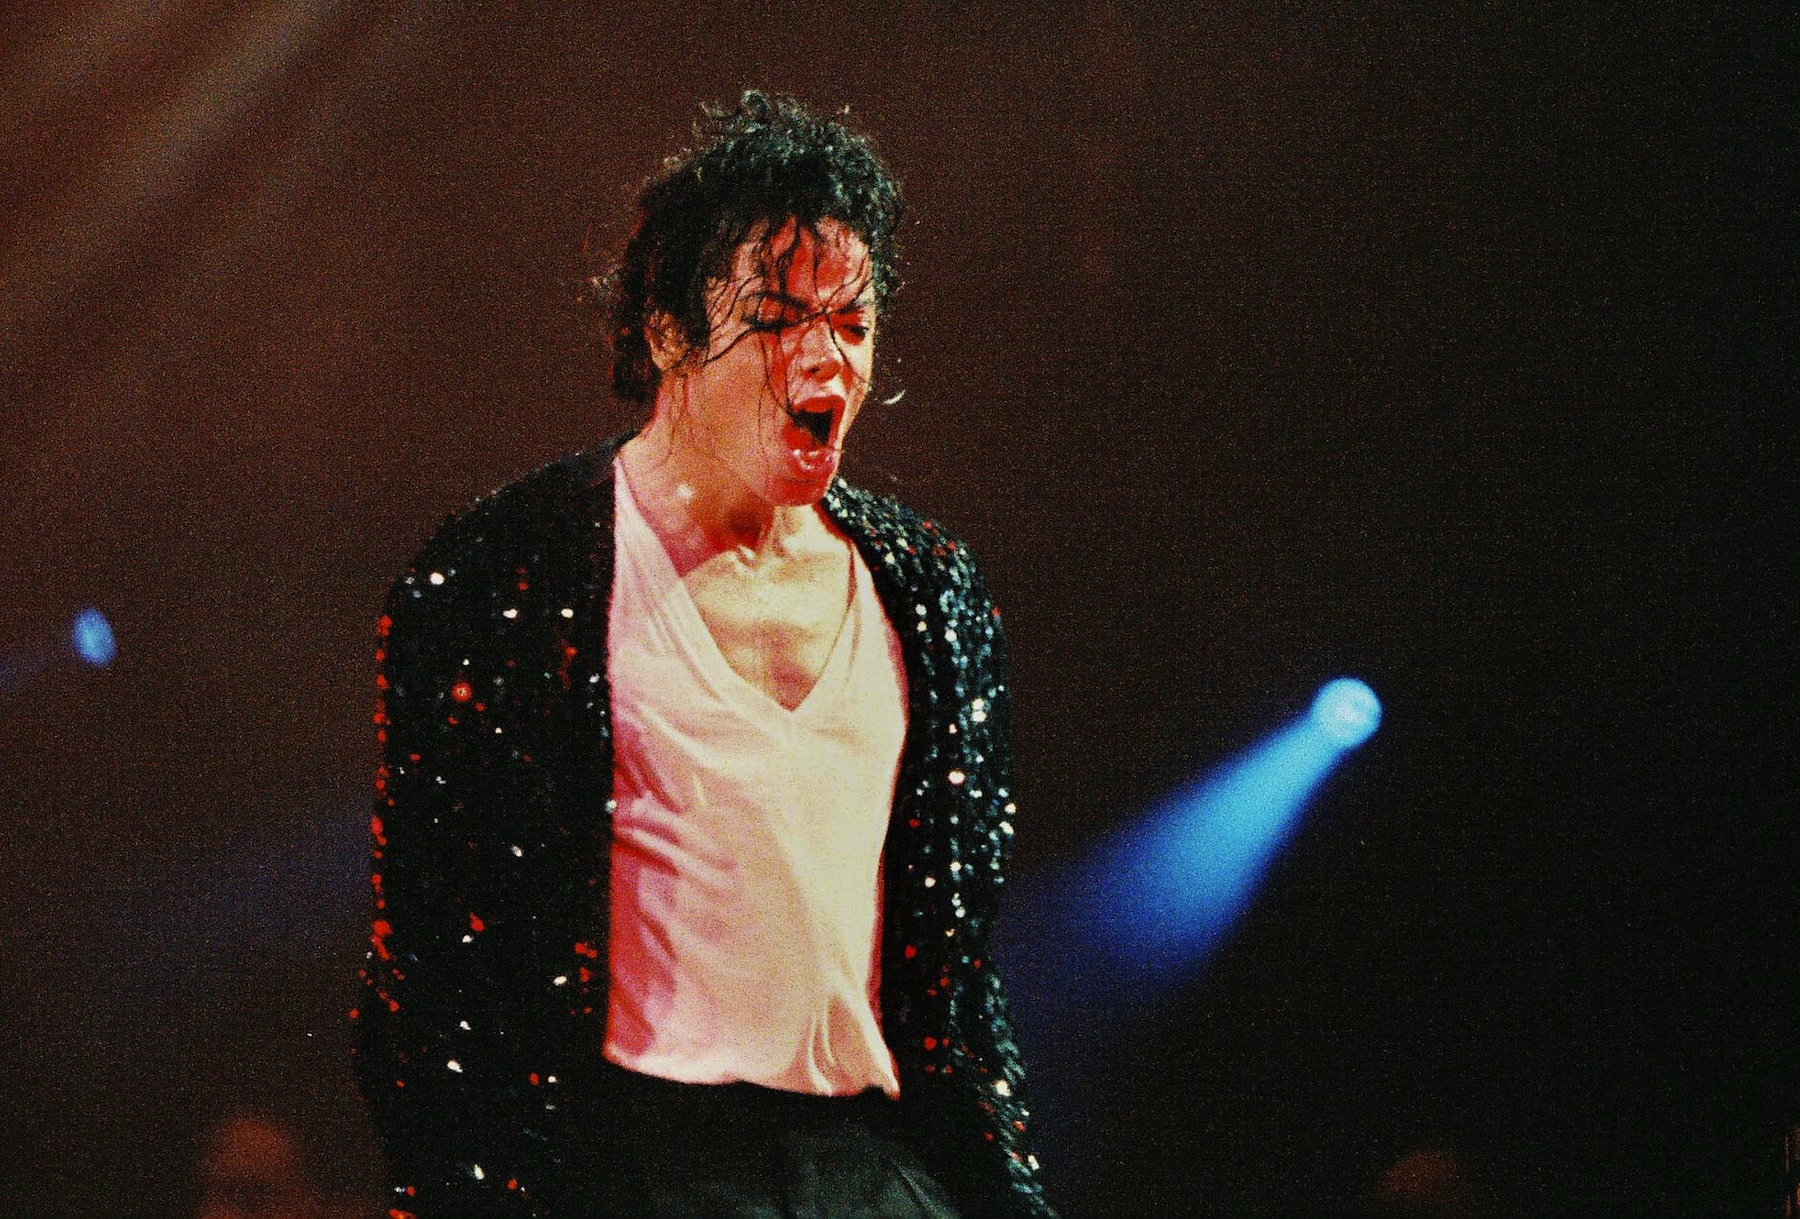 Michael Jackson Hologram to Perform at Billboard Music Awards